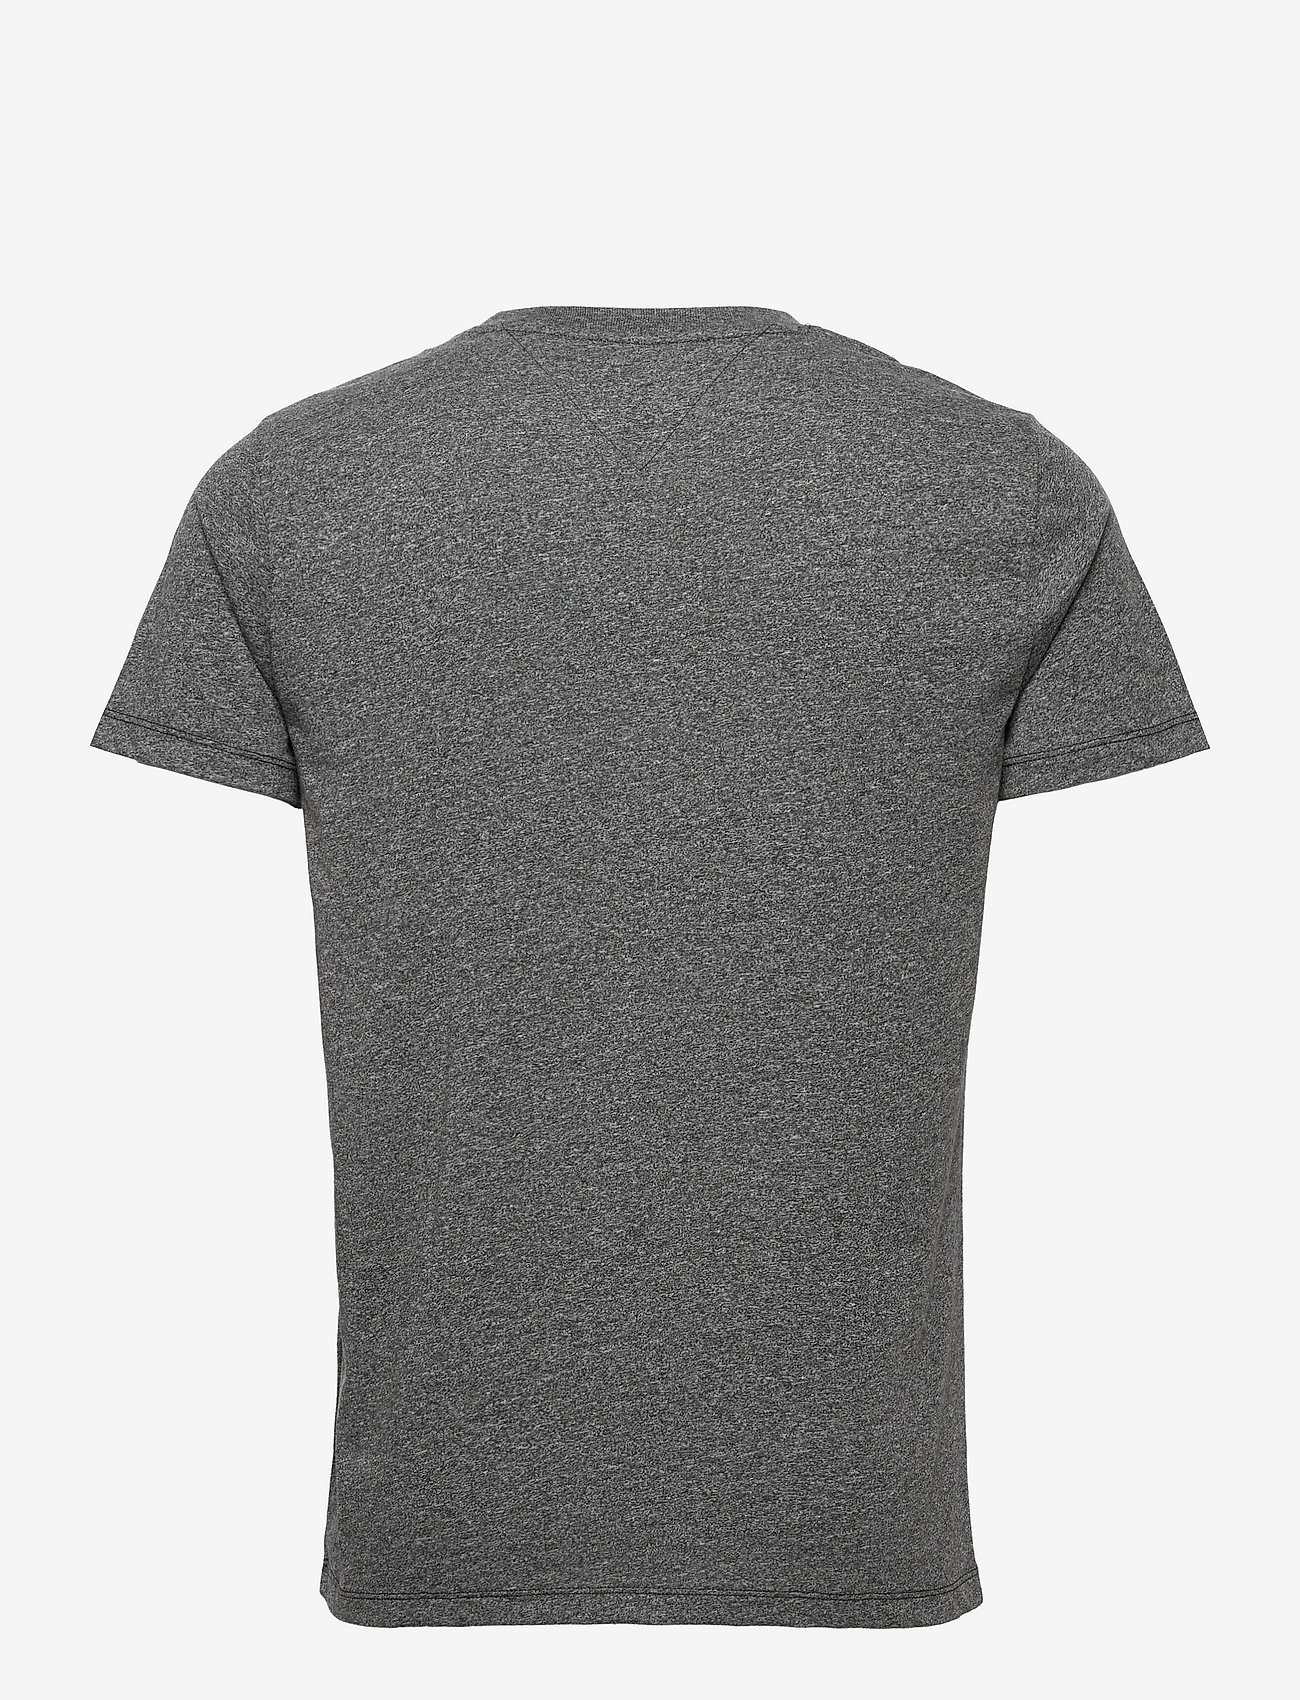 Tommy Jeans - TJM SLIM C NECK TEE - basic t-shirts - black - 1